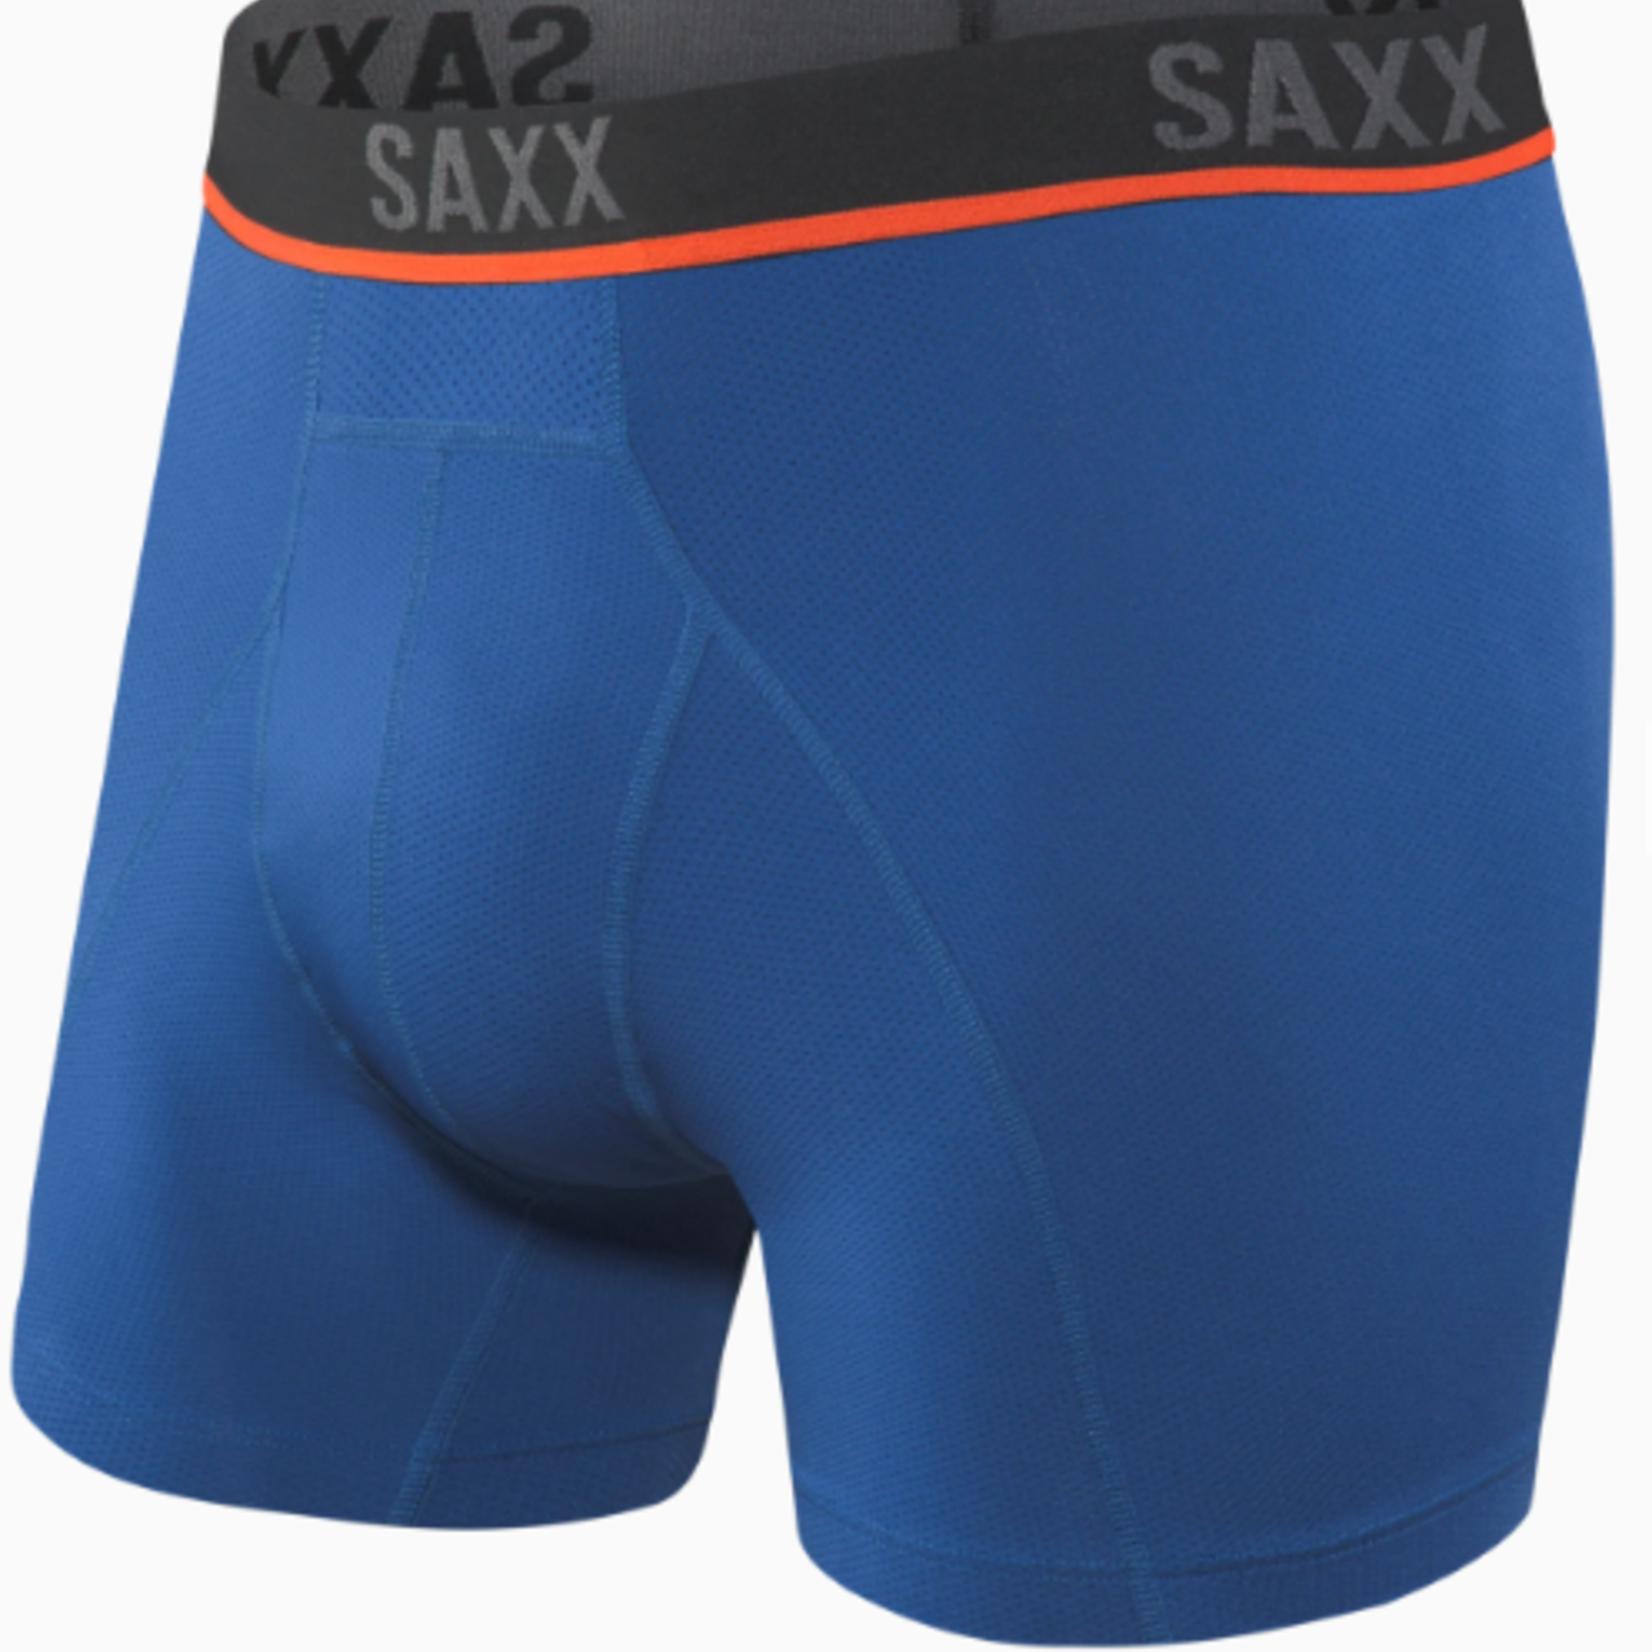 Saxx Kinetic HD City Blue